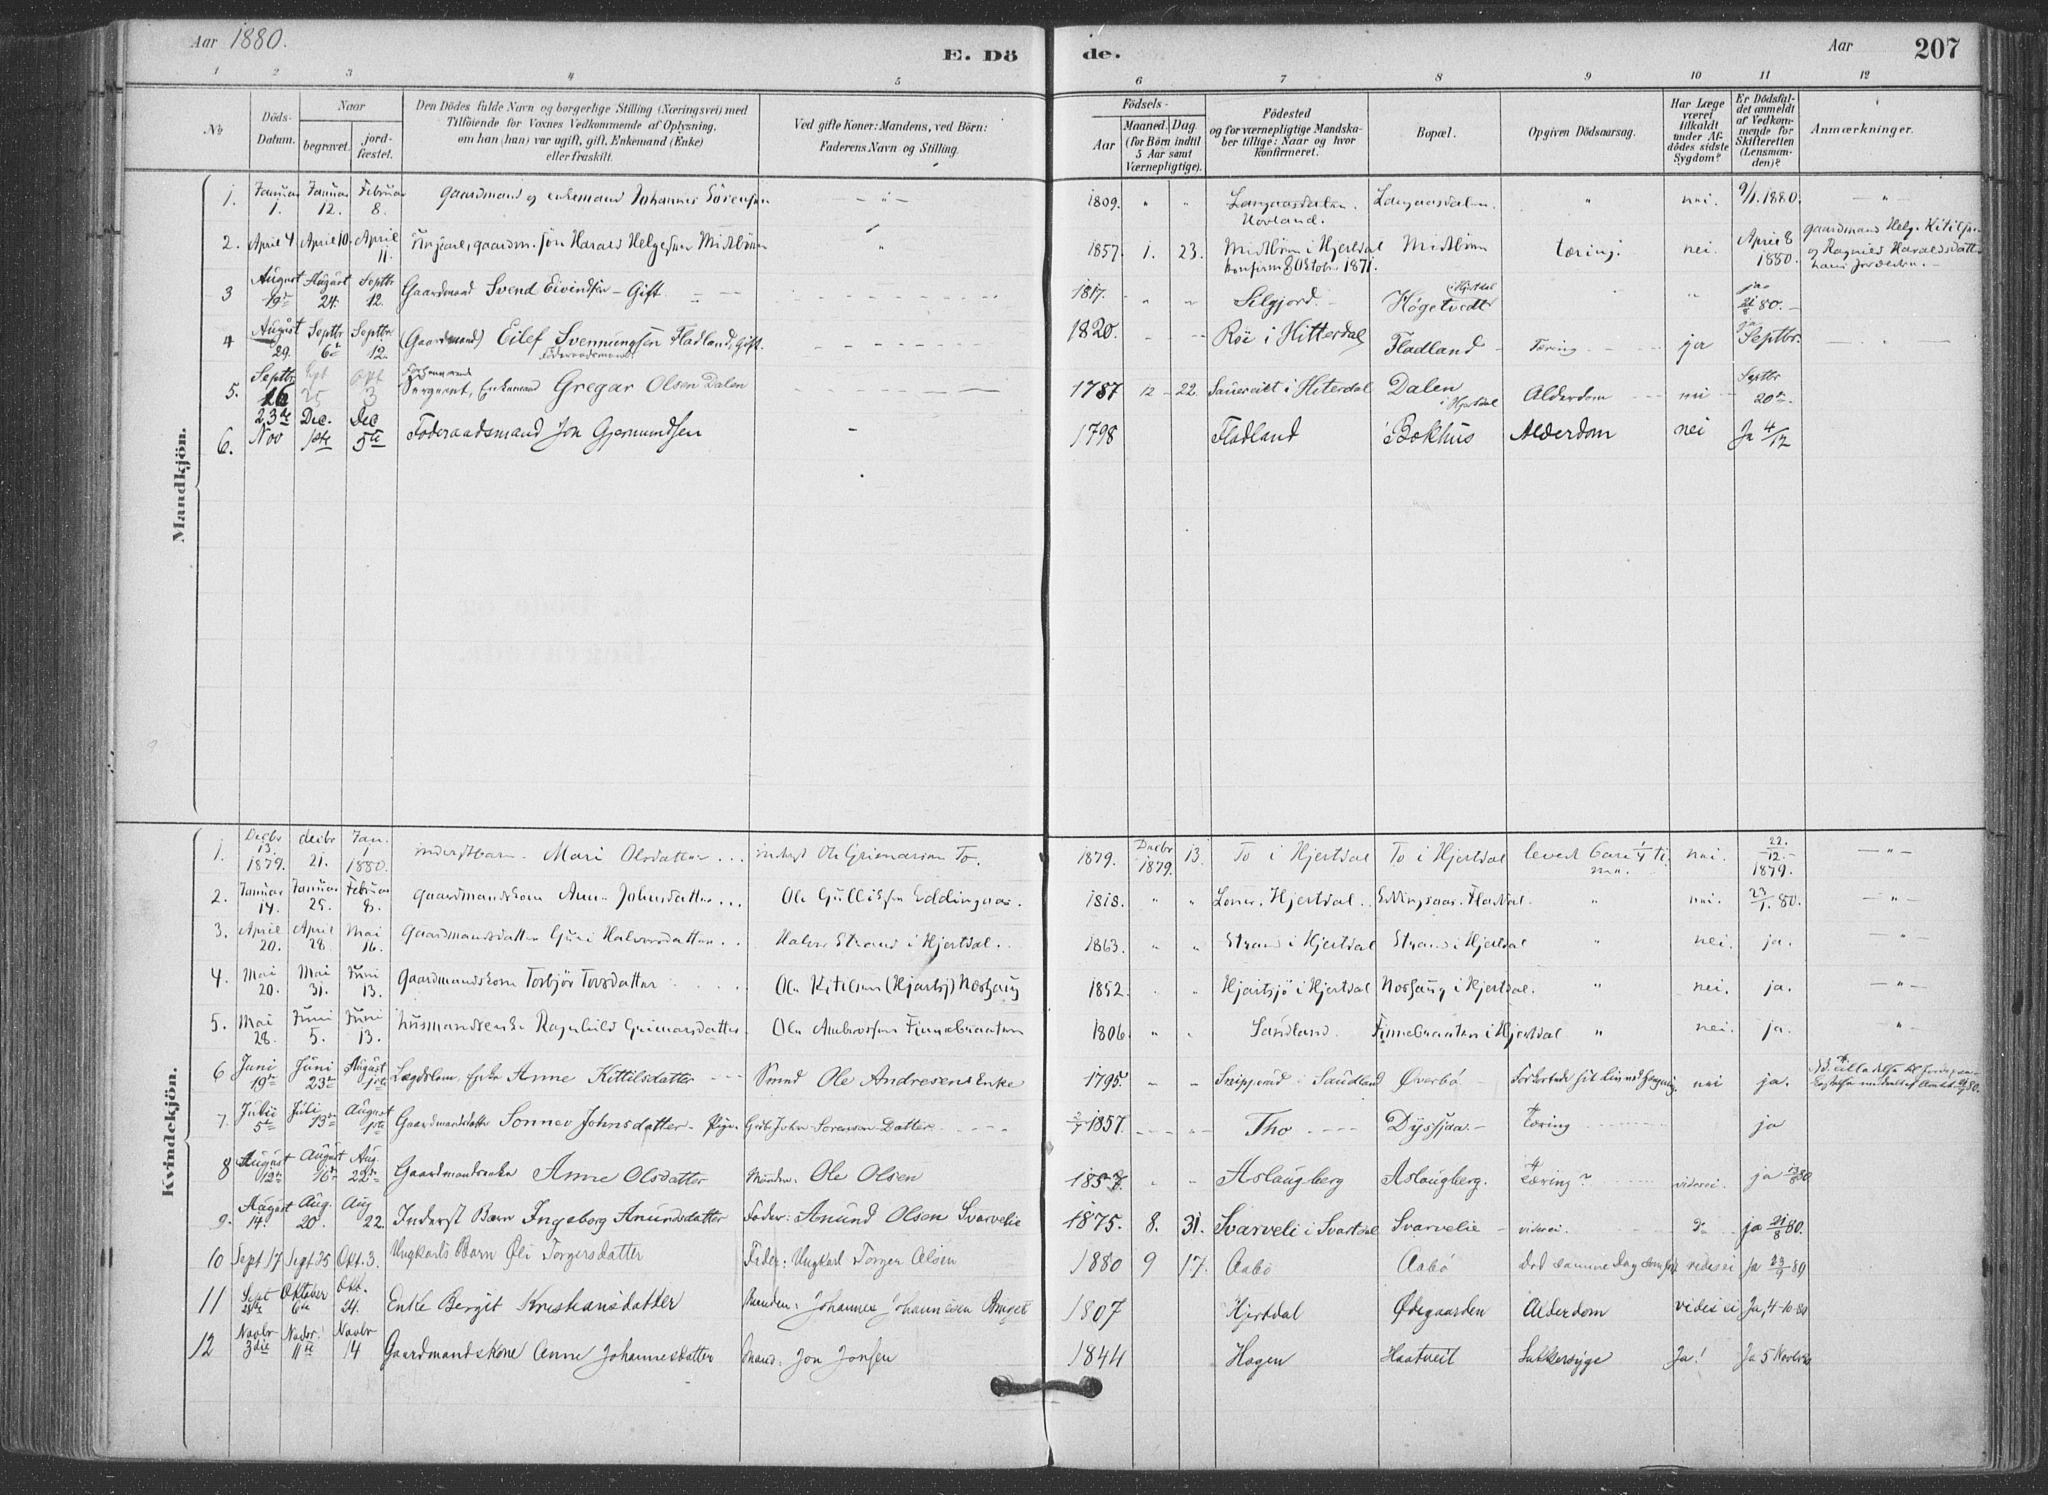 SAKO, Hjartdal kirkebøker, F/Fa/L0010: Ministerialbok nr. I 10, 1880-1929, s. 207